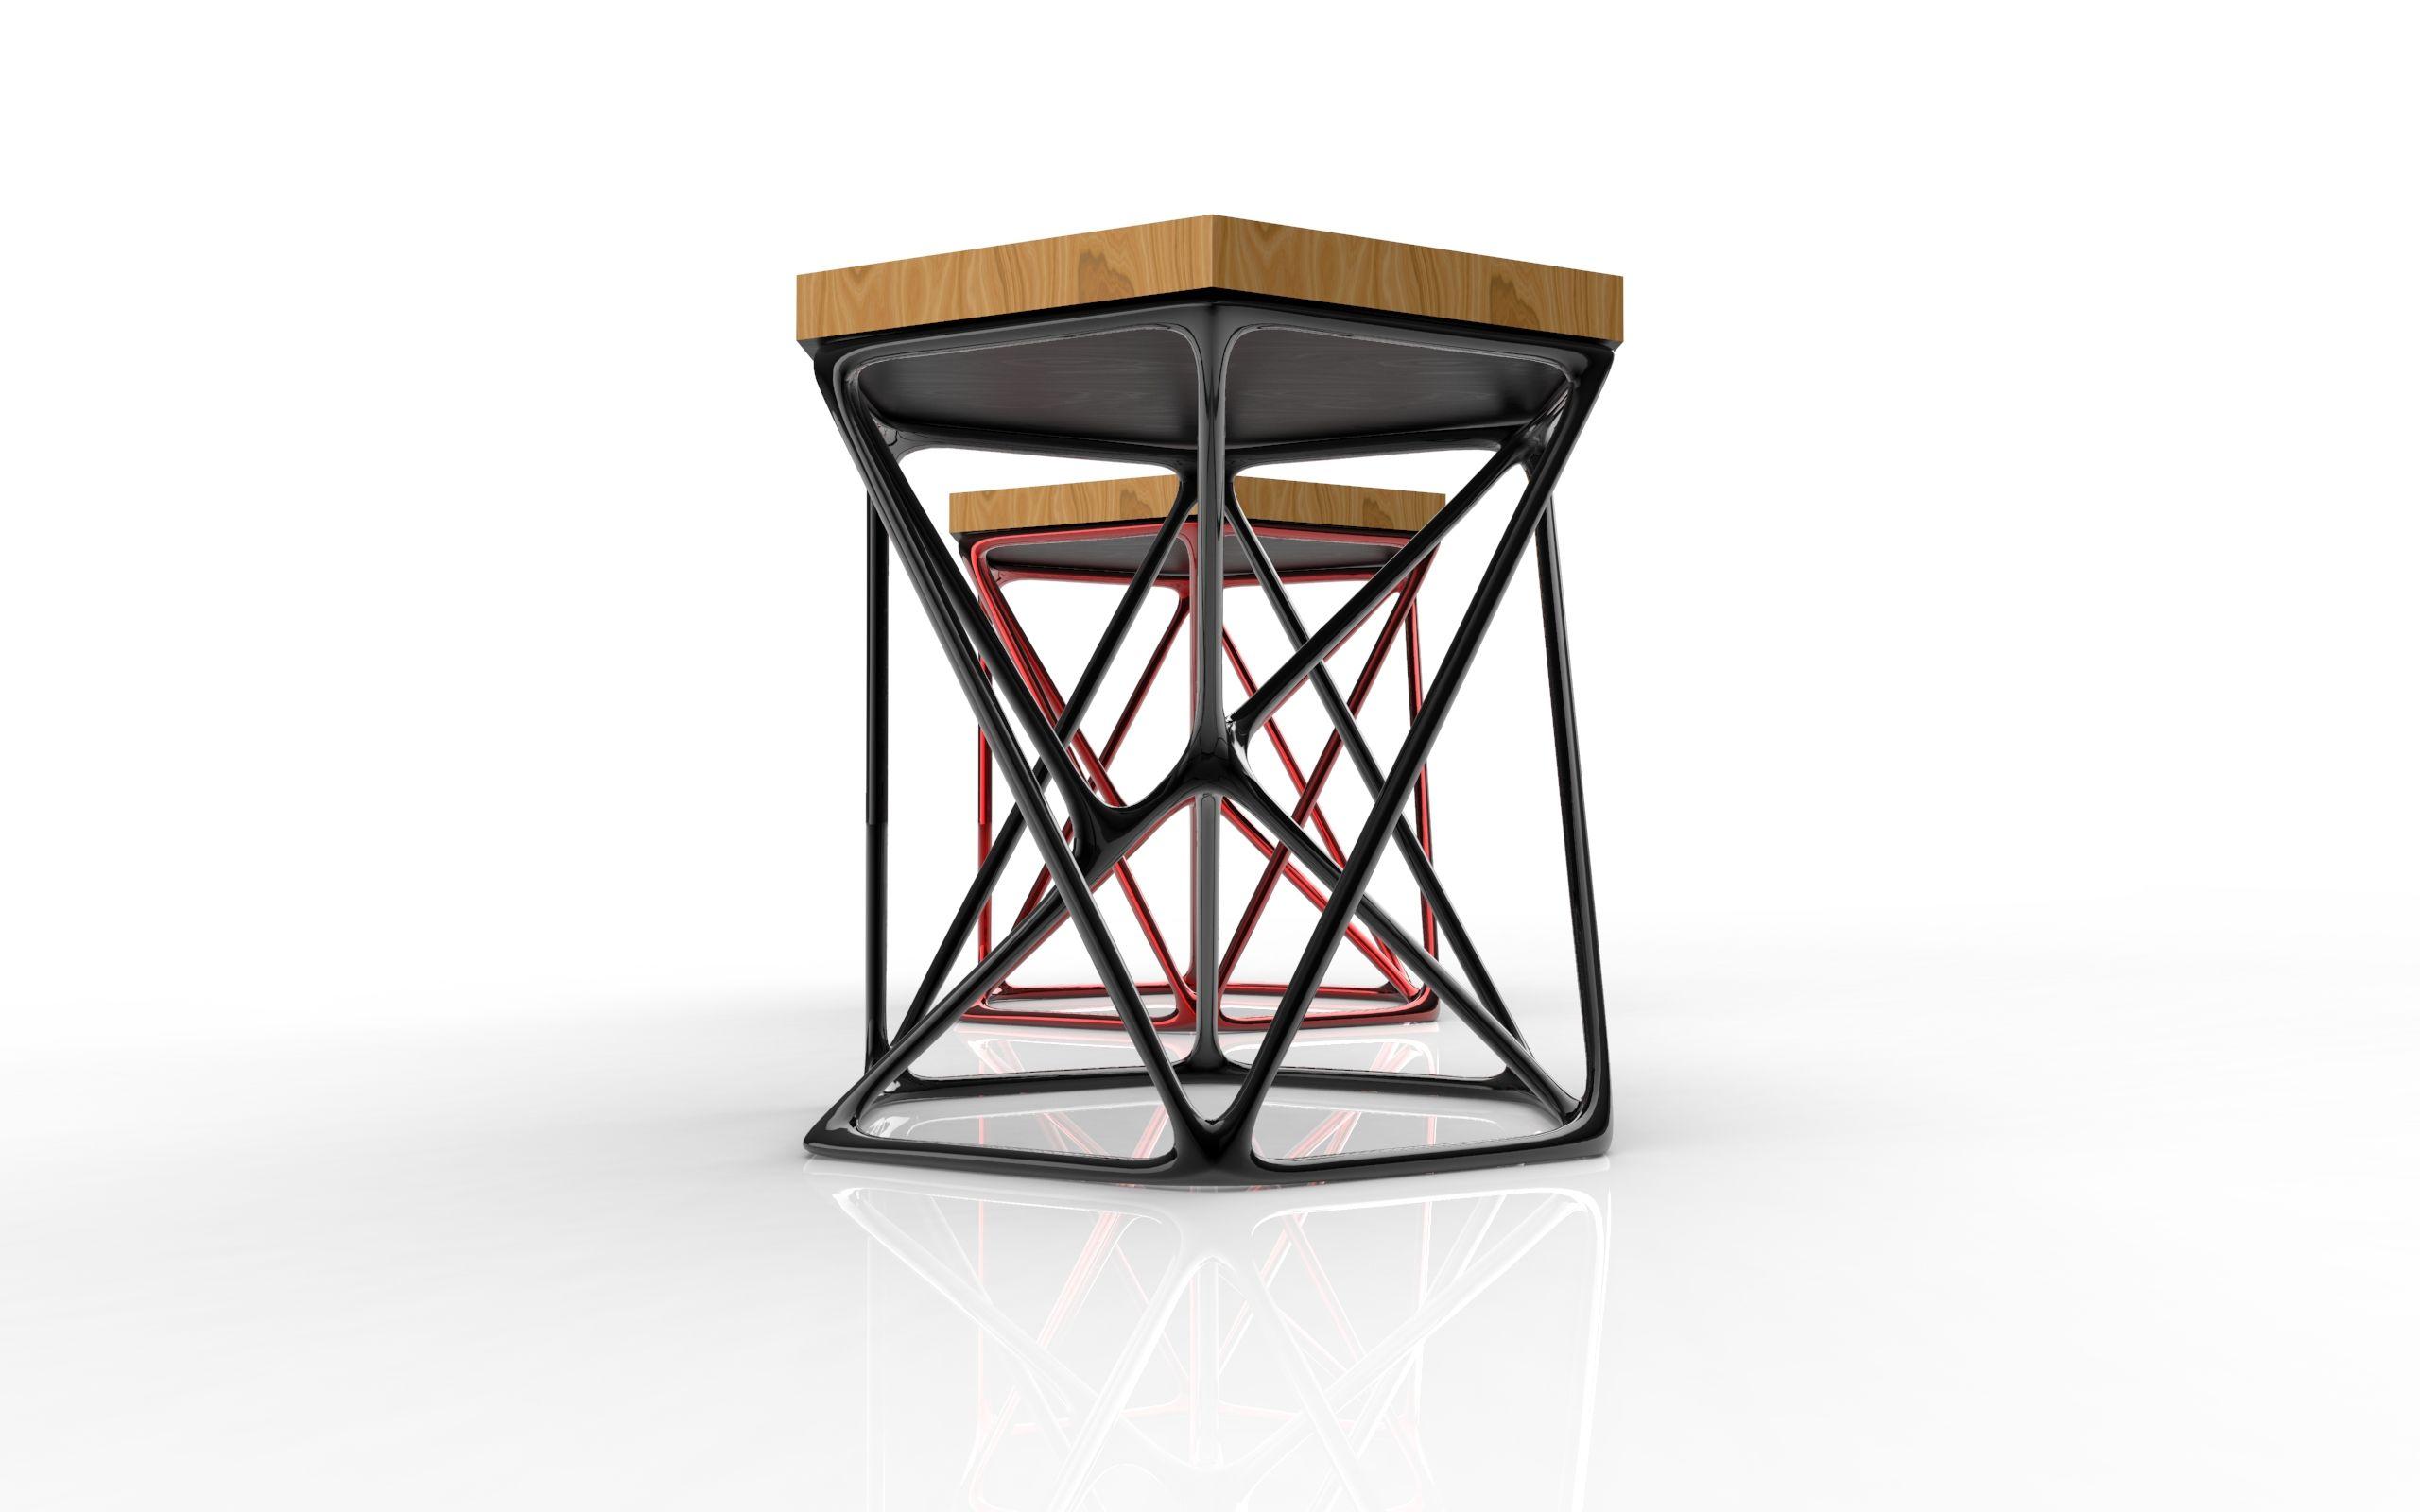 Fabrica-de-nerdes---design-ind4-lcs19-makers-3500-3500